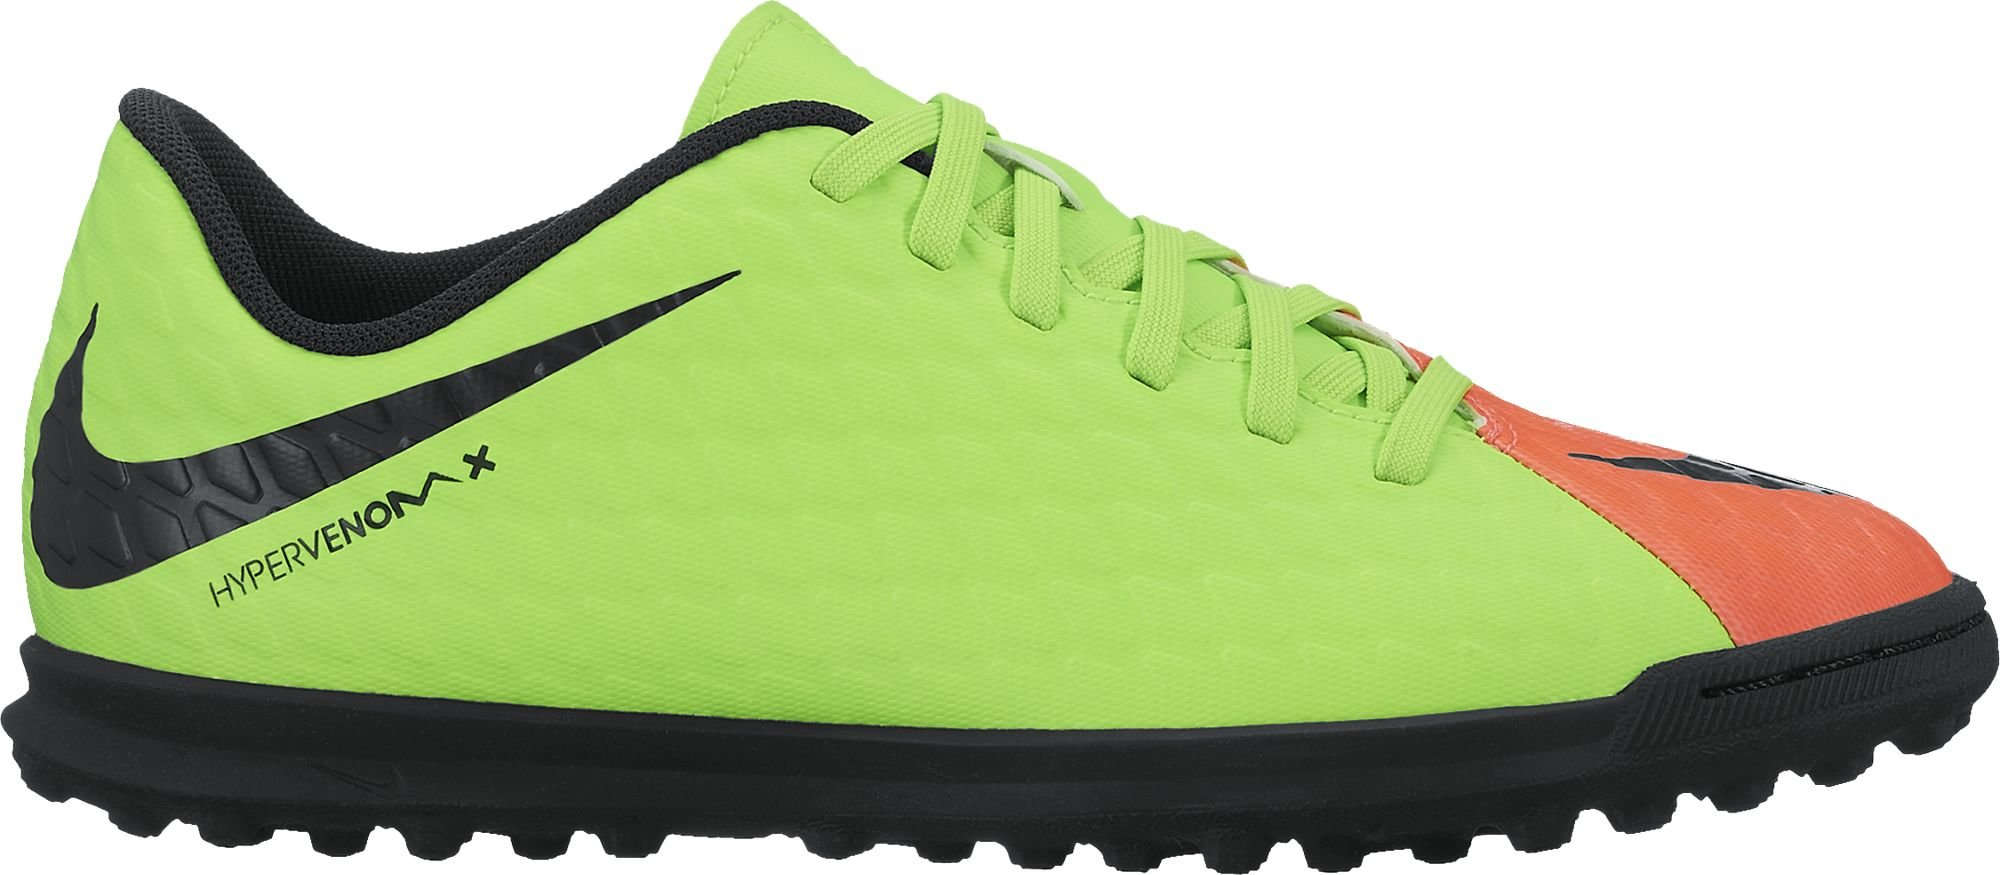 Nike JR Hypervenomx Phade III TF Shoes Electric Green/Black 5